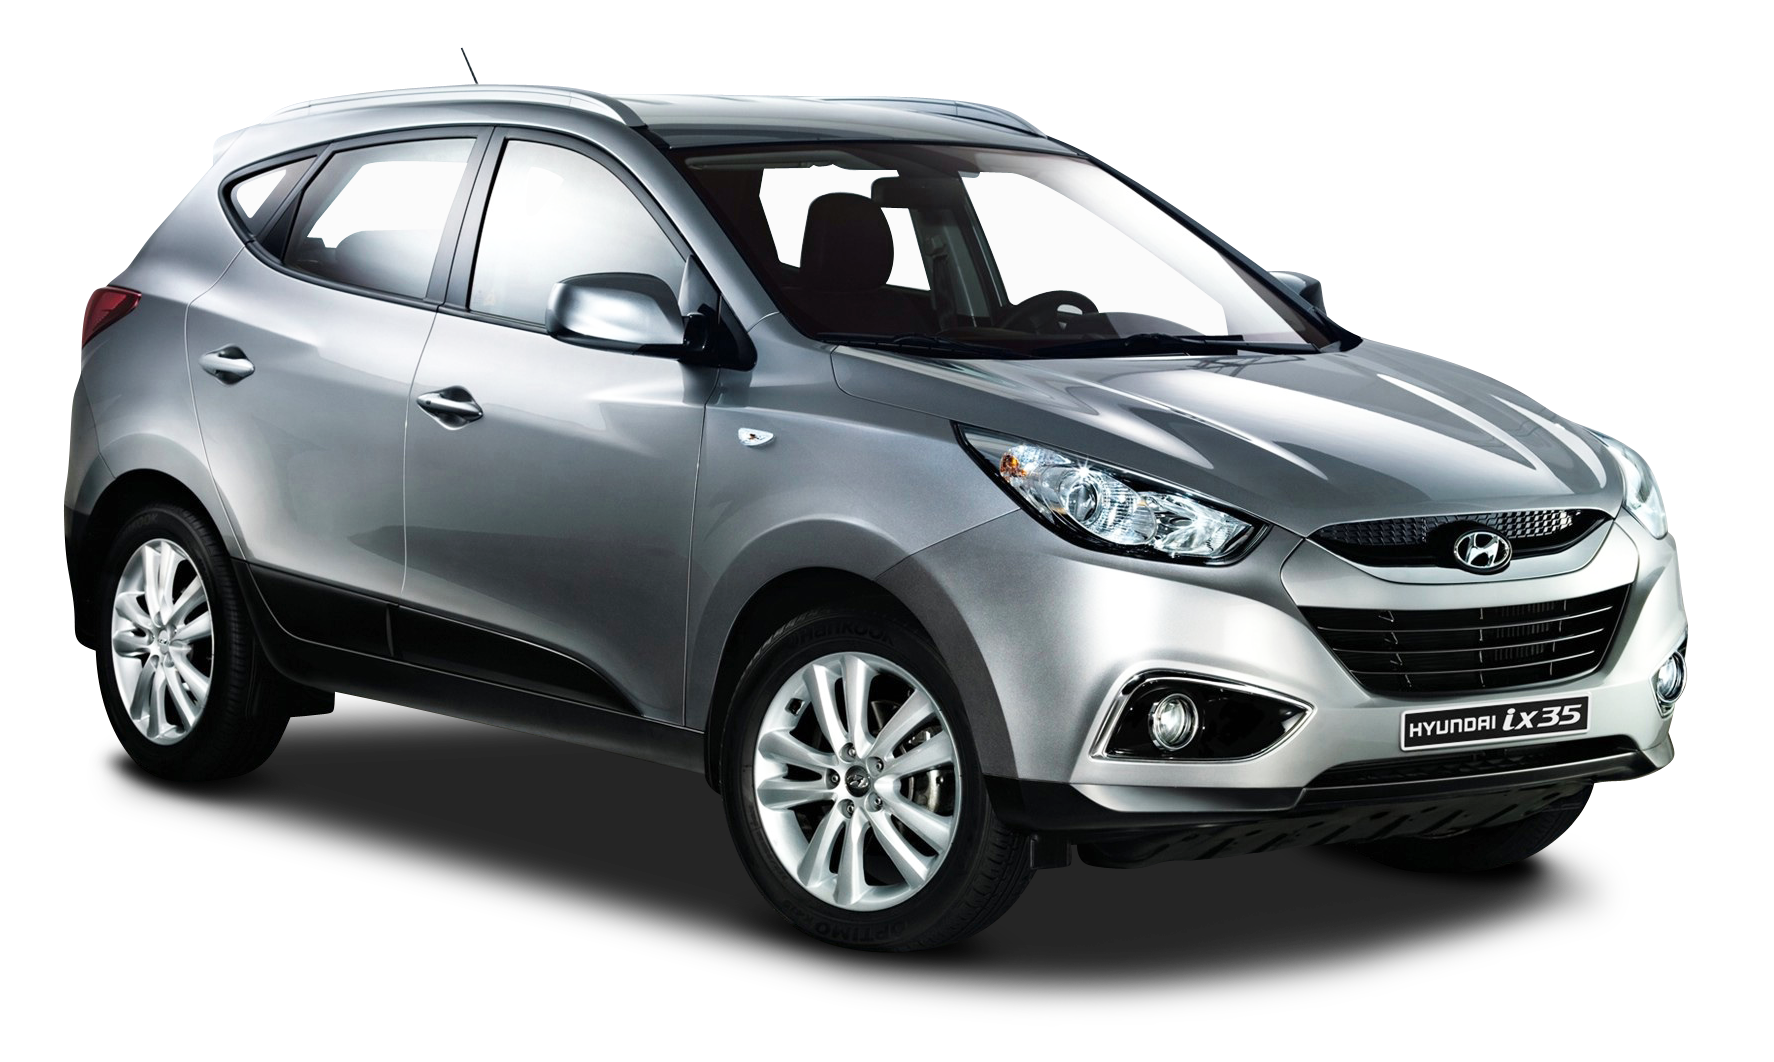 Hyundai ix35 Car